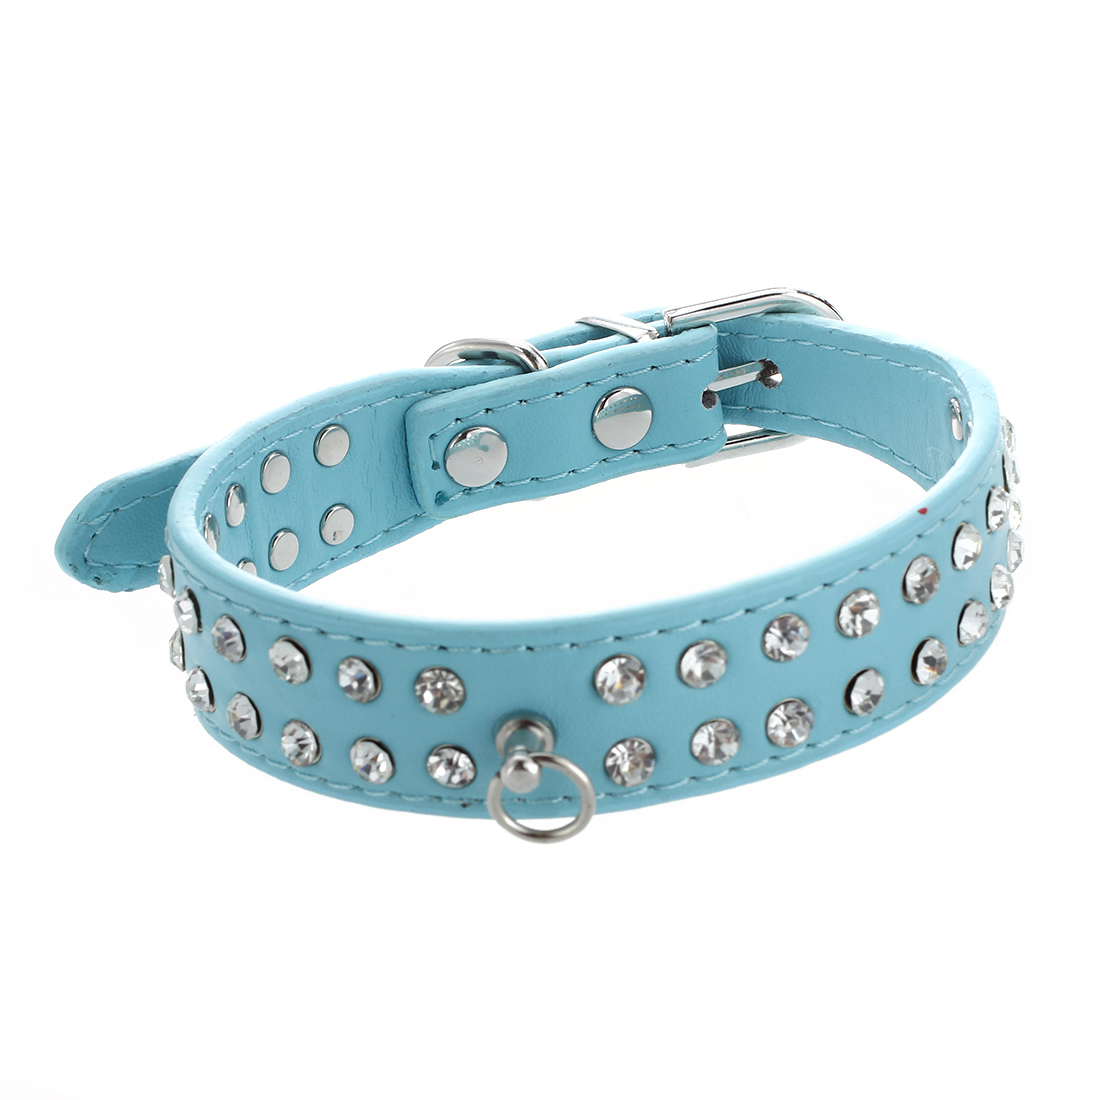 Practical Boutique PU Leather Strap Necklace for Pet Dog Zircons Blue Size S